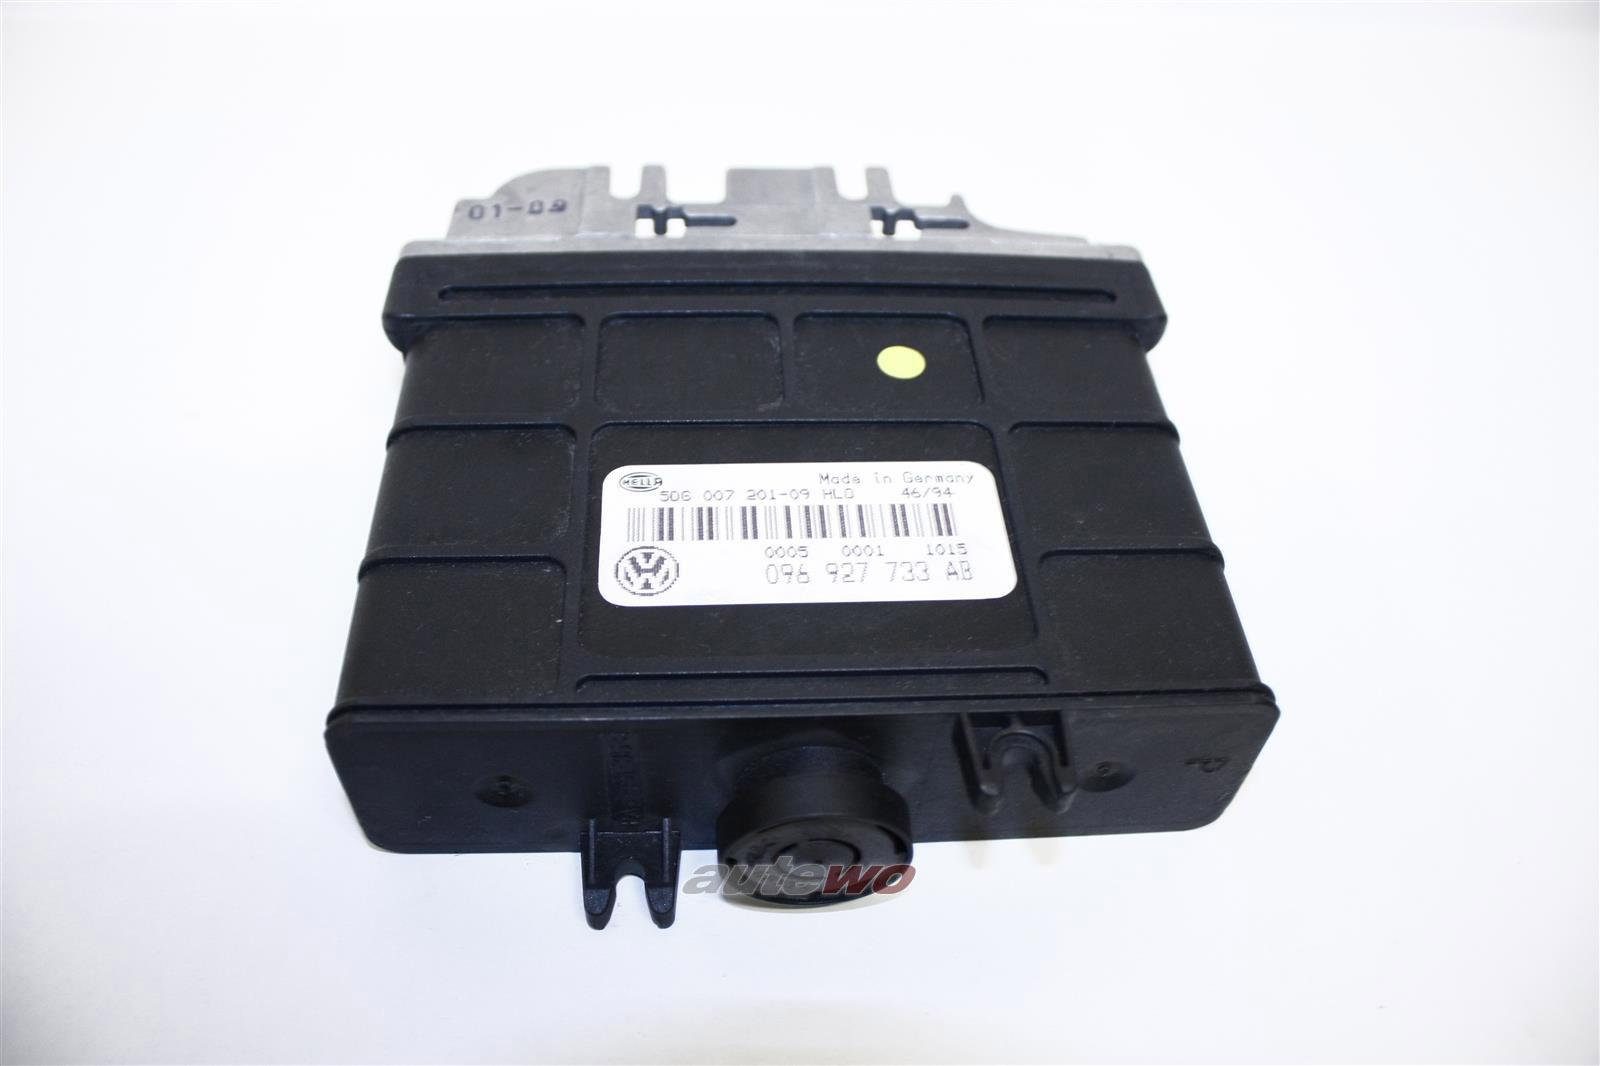 NEUWERTIG! VW Golf/Jetta 2.0l 115PS ABA Steuergerät Getriebe 096927733AT 096927733AB